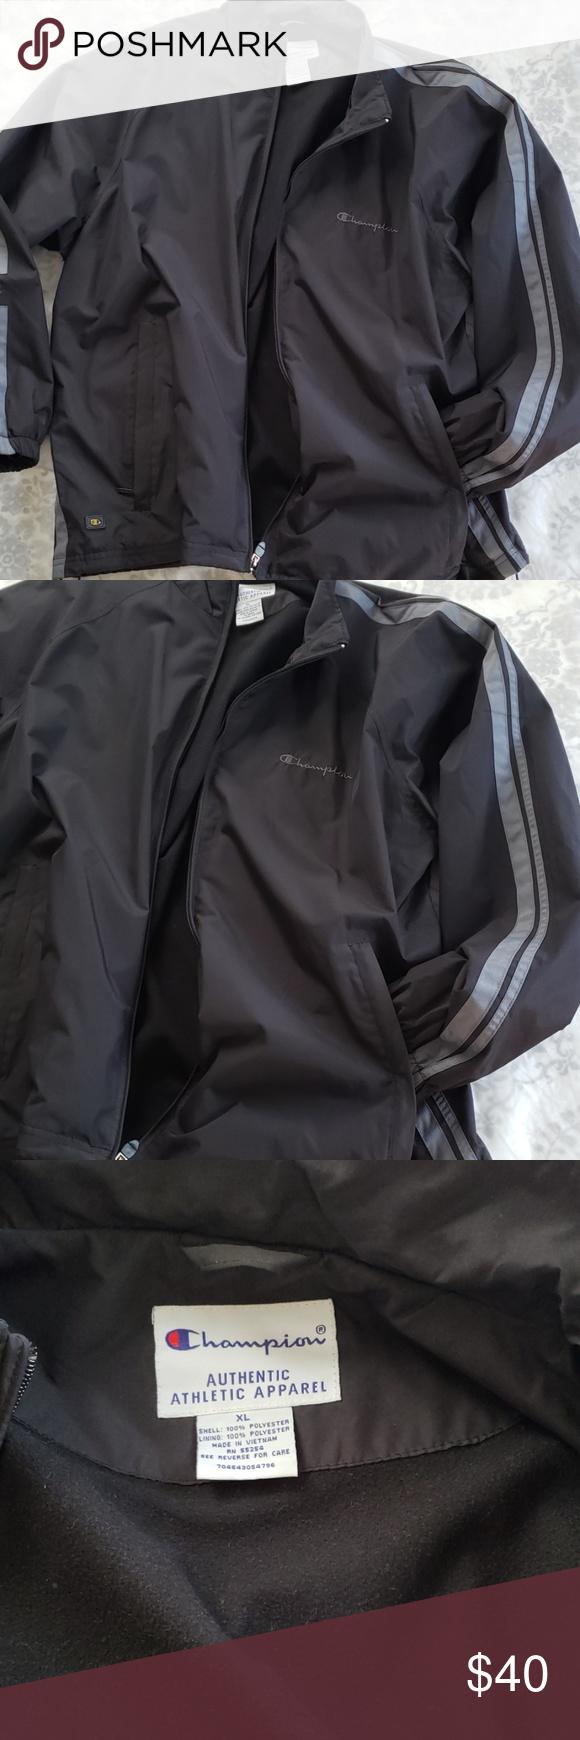 Champion Mens Jacket Size Xl Champion Jacket Mens Jackets Men [ 1740 x 580 Pixel ]